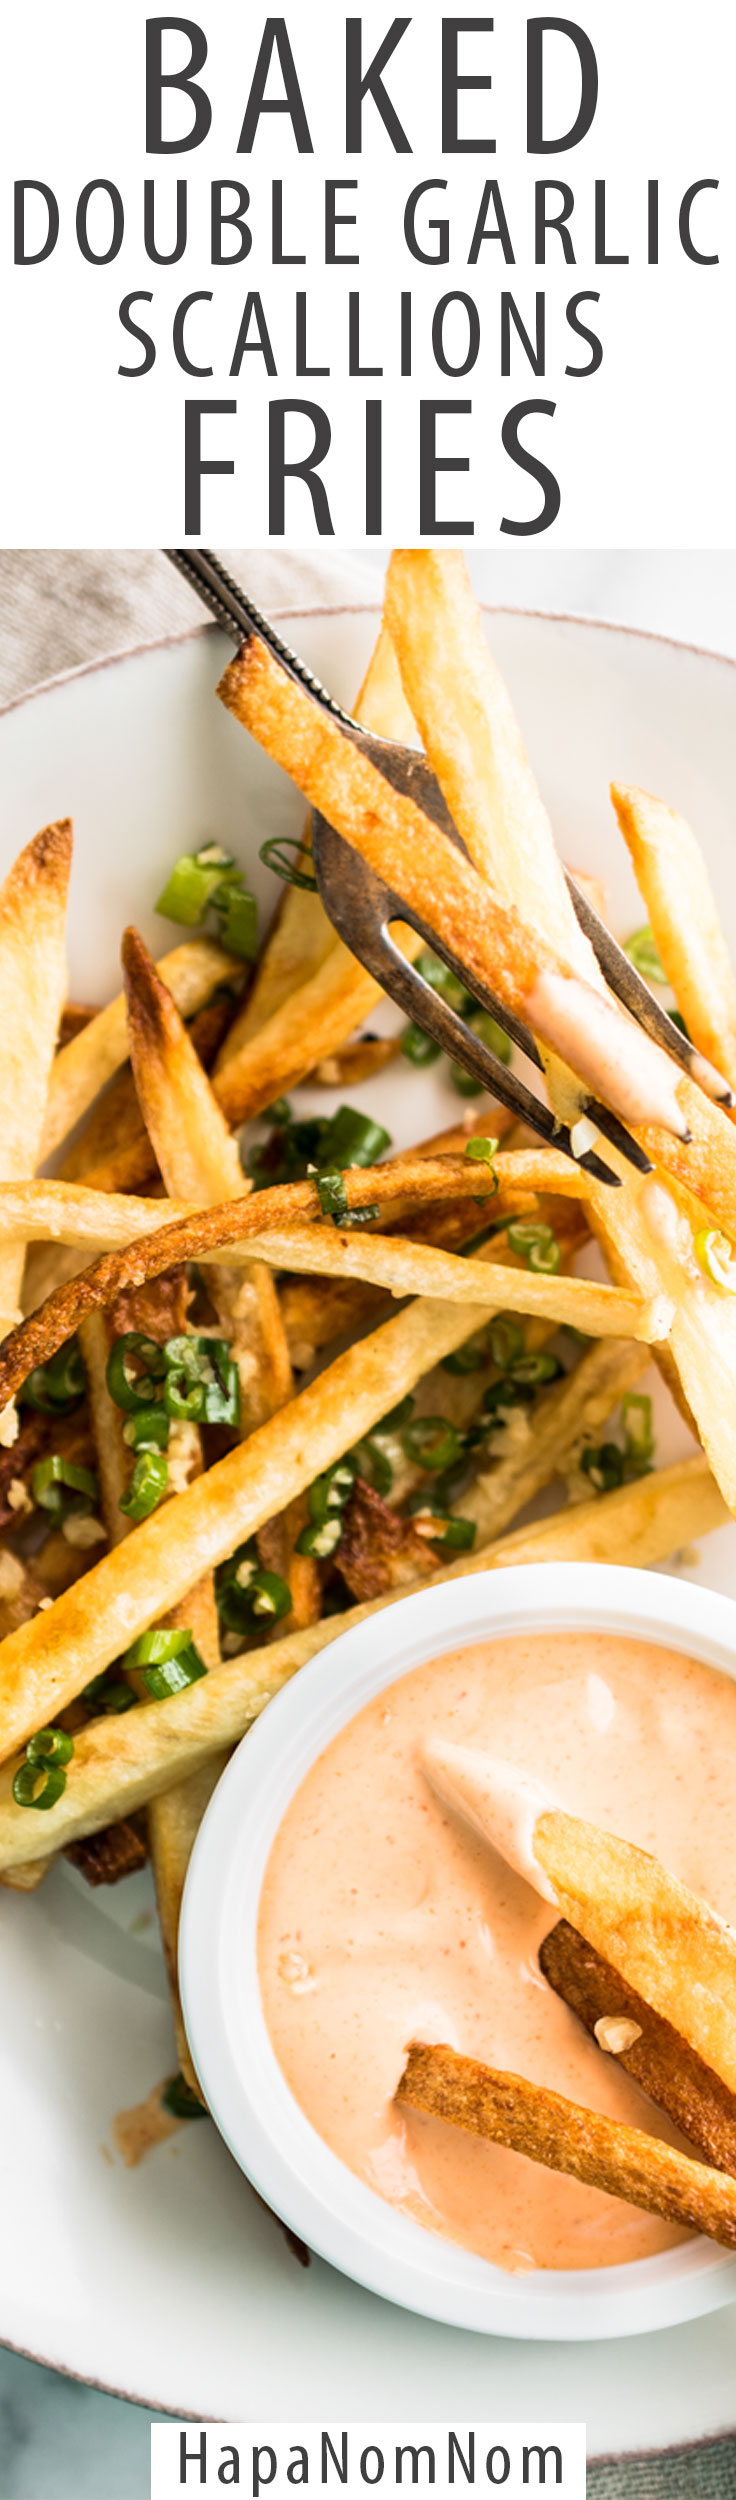 Crispy Double Garlic and Scallion Baked Fries with Sriracha Mayo!